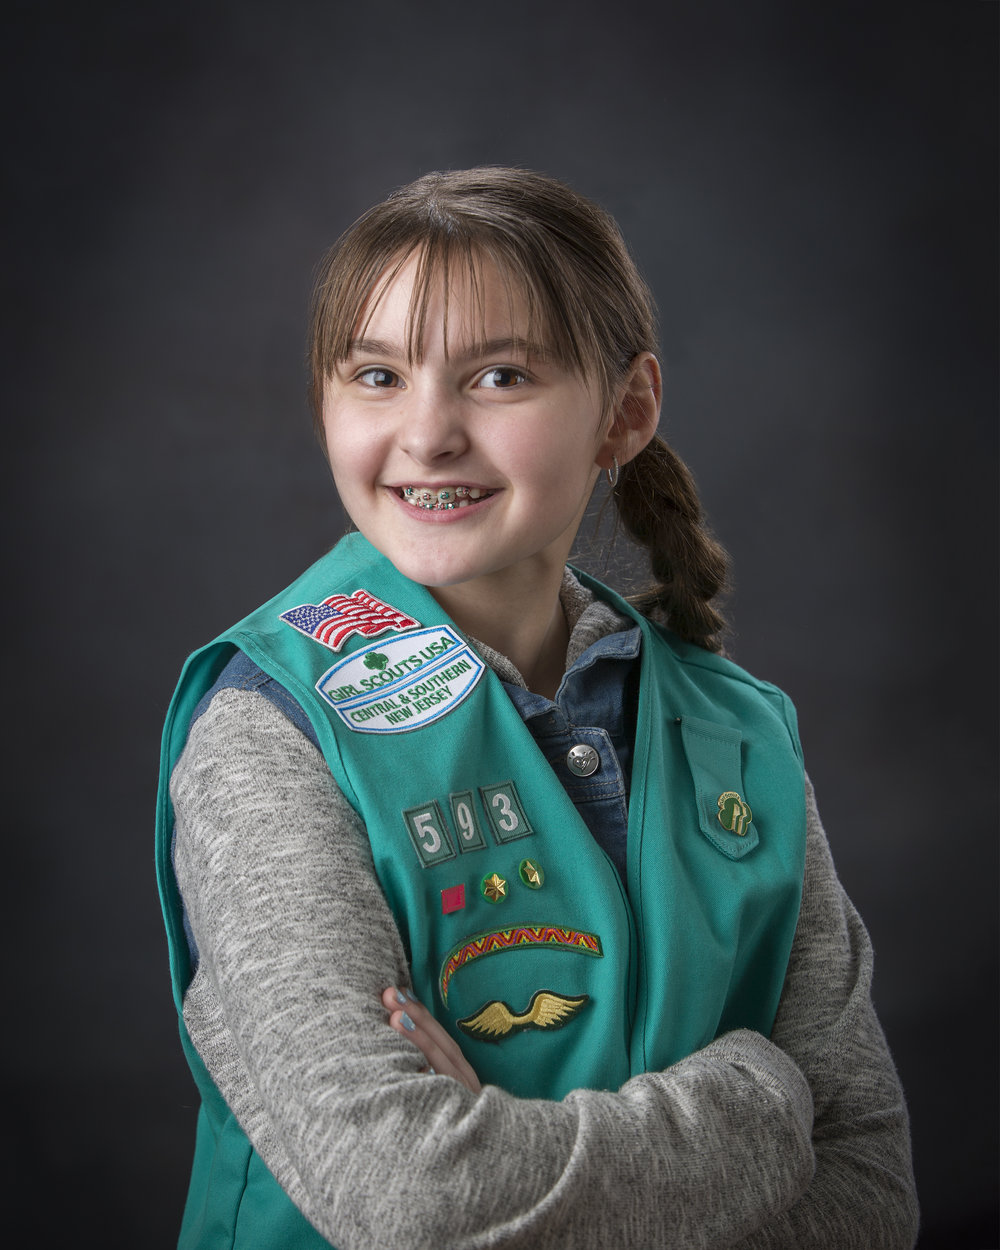 girl scouts-26  8x10.jpg